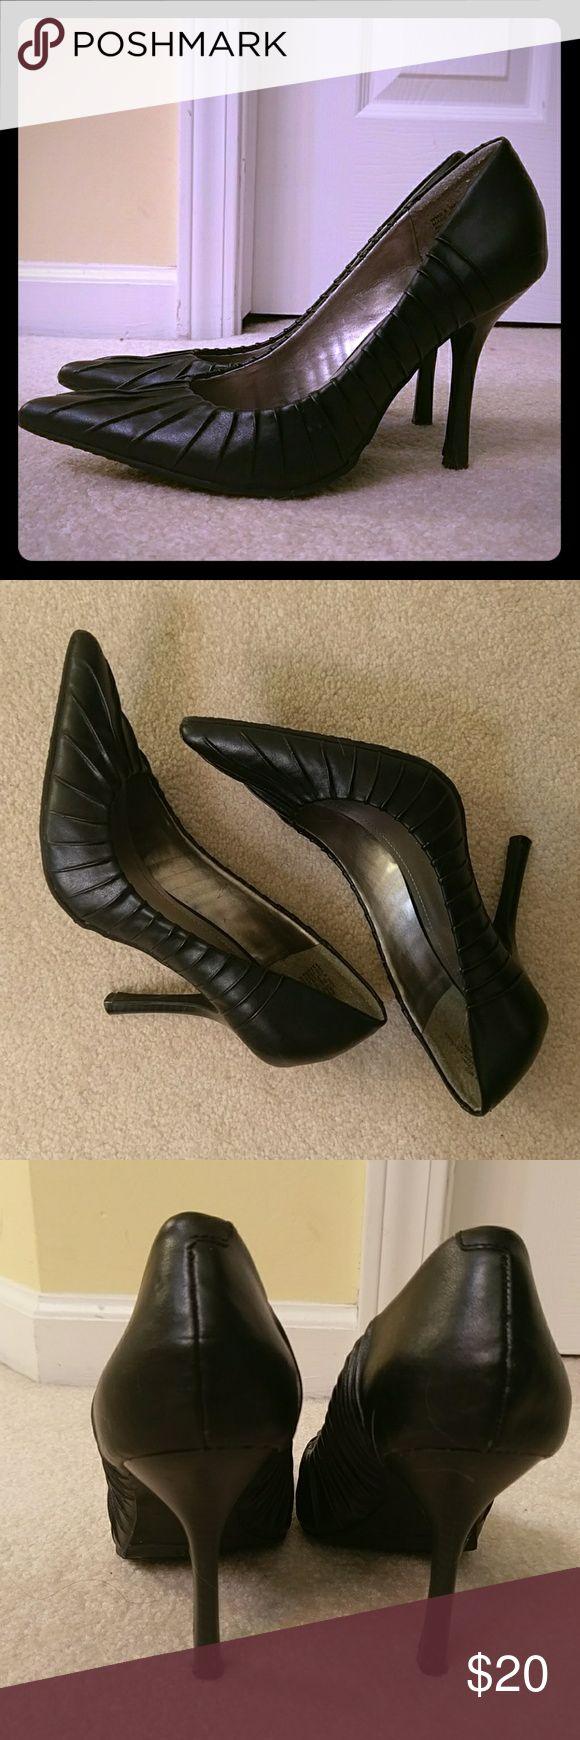 Sexy heels Approx 4.5 inch heel. In great condition. Elle Shoes Heels